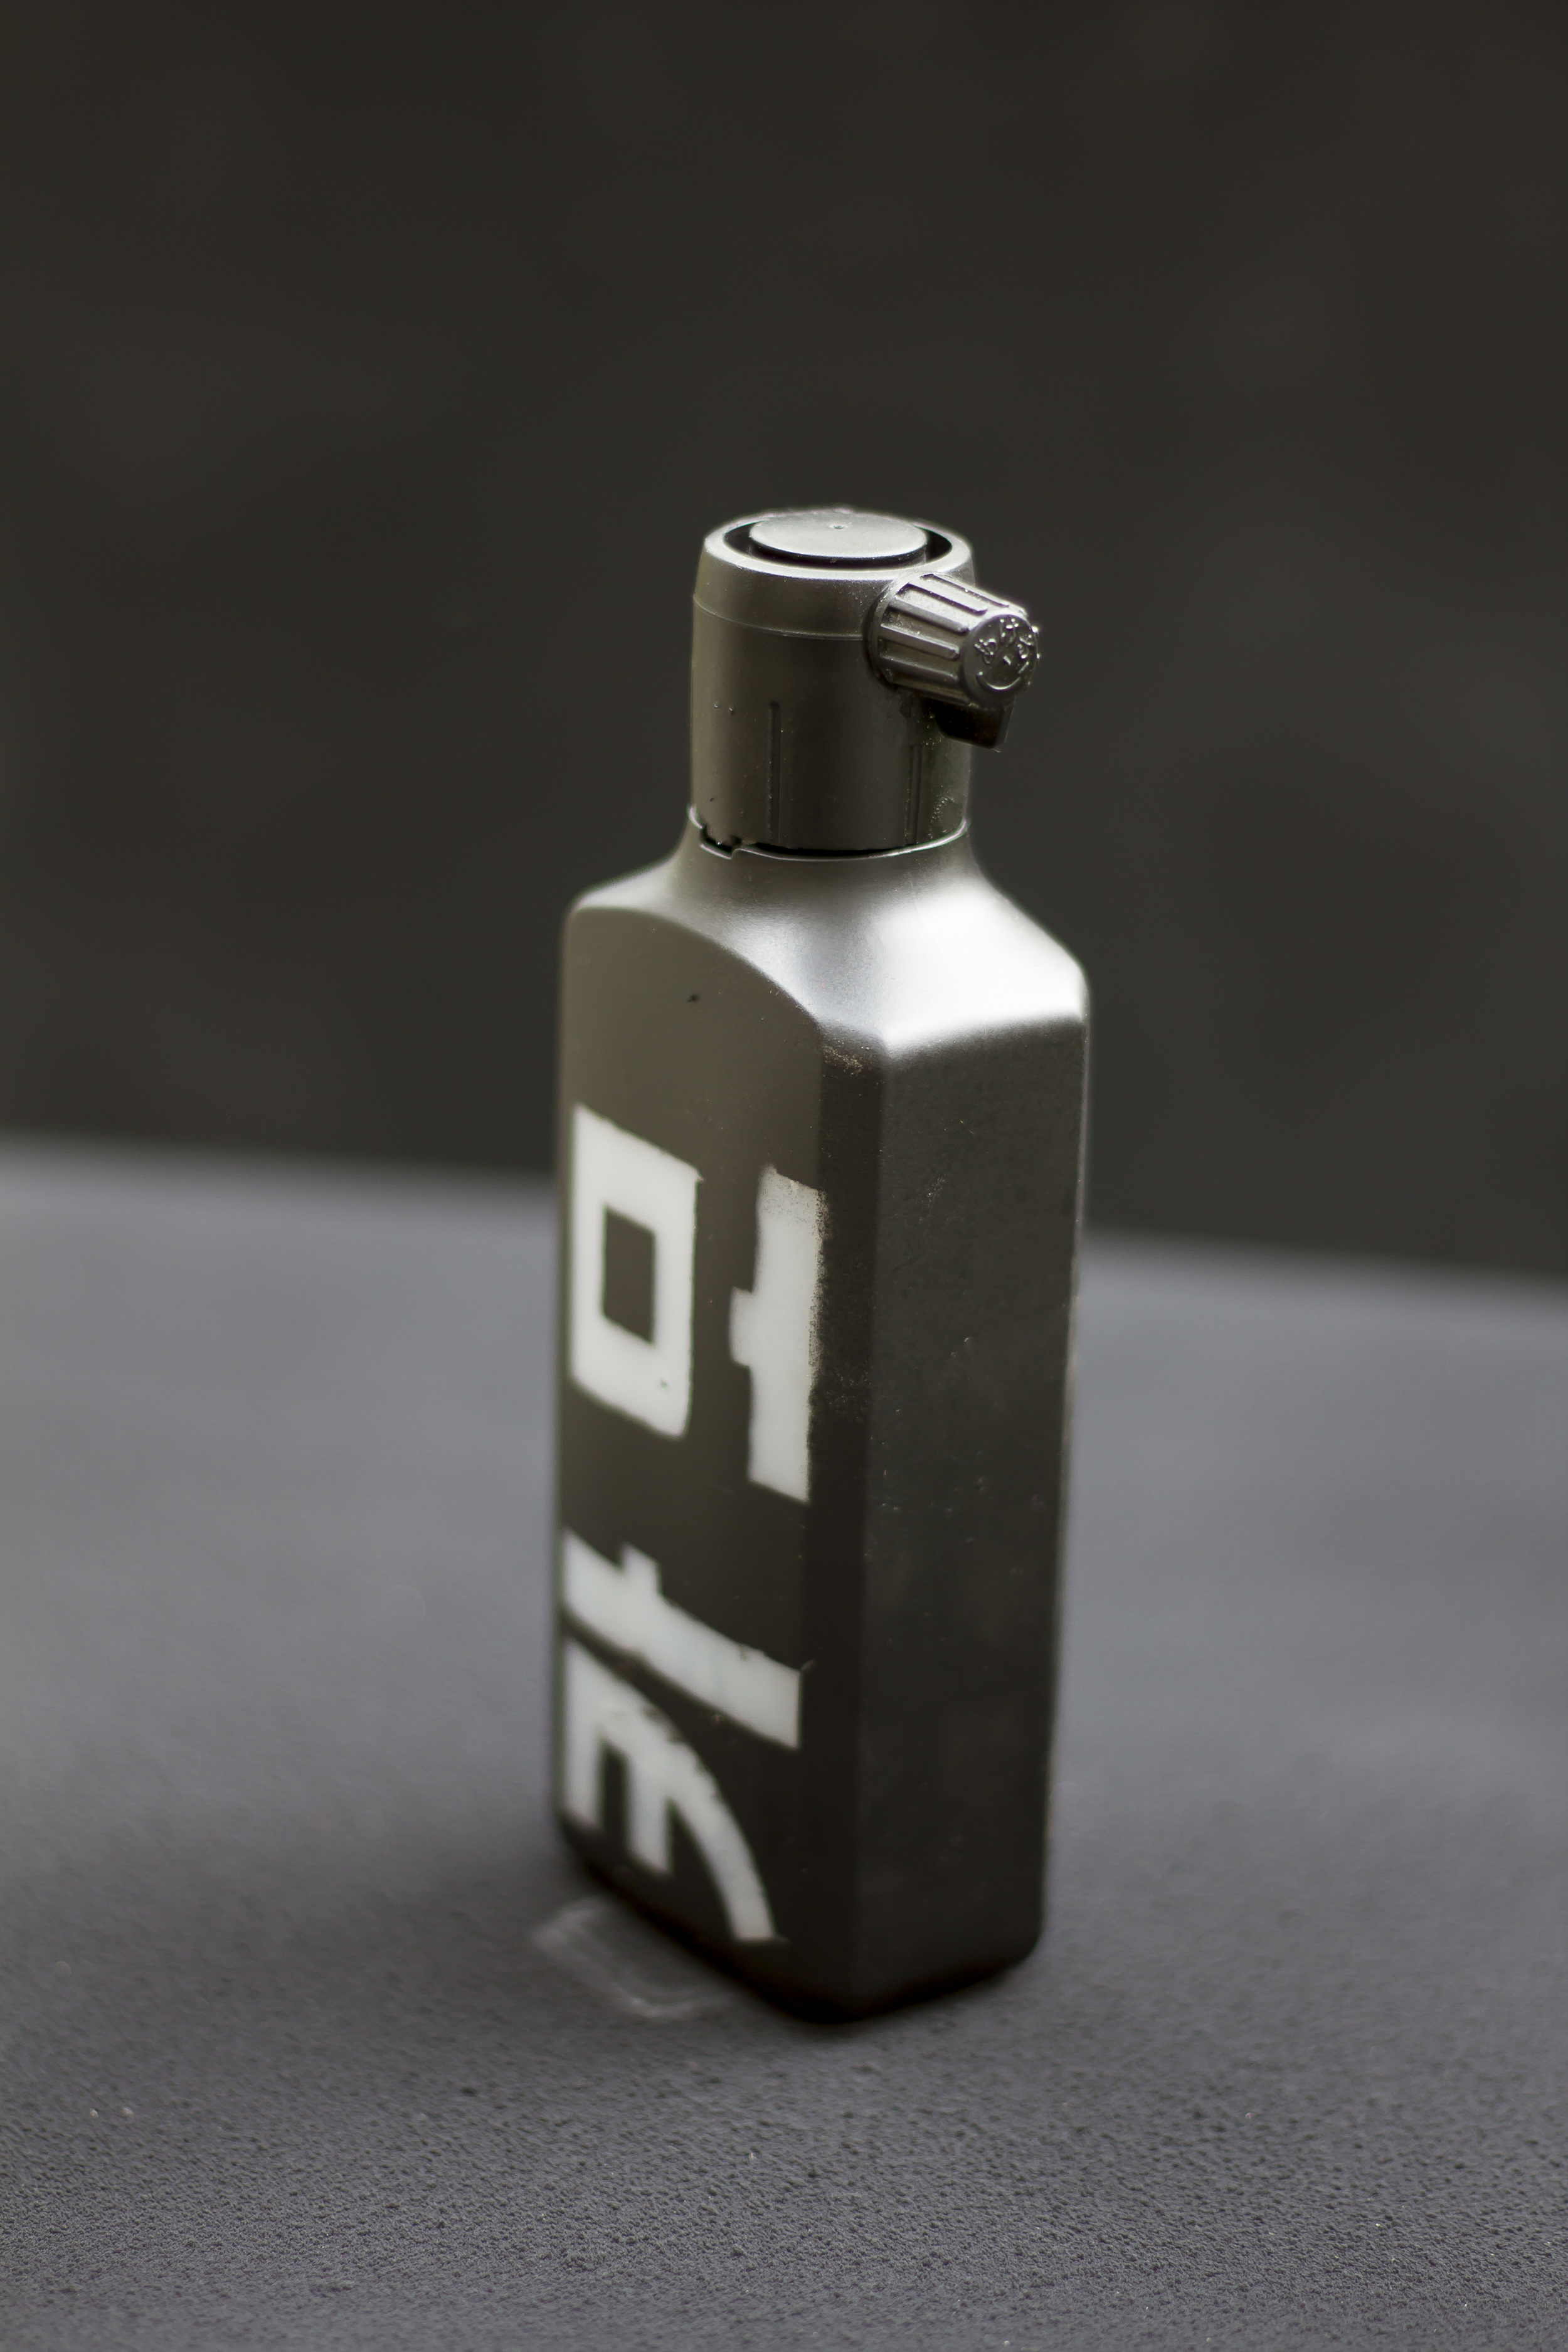 anticamo_bottle3.JPG